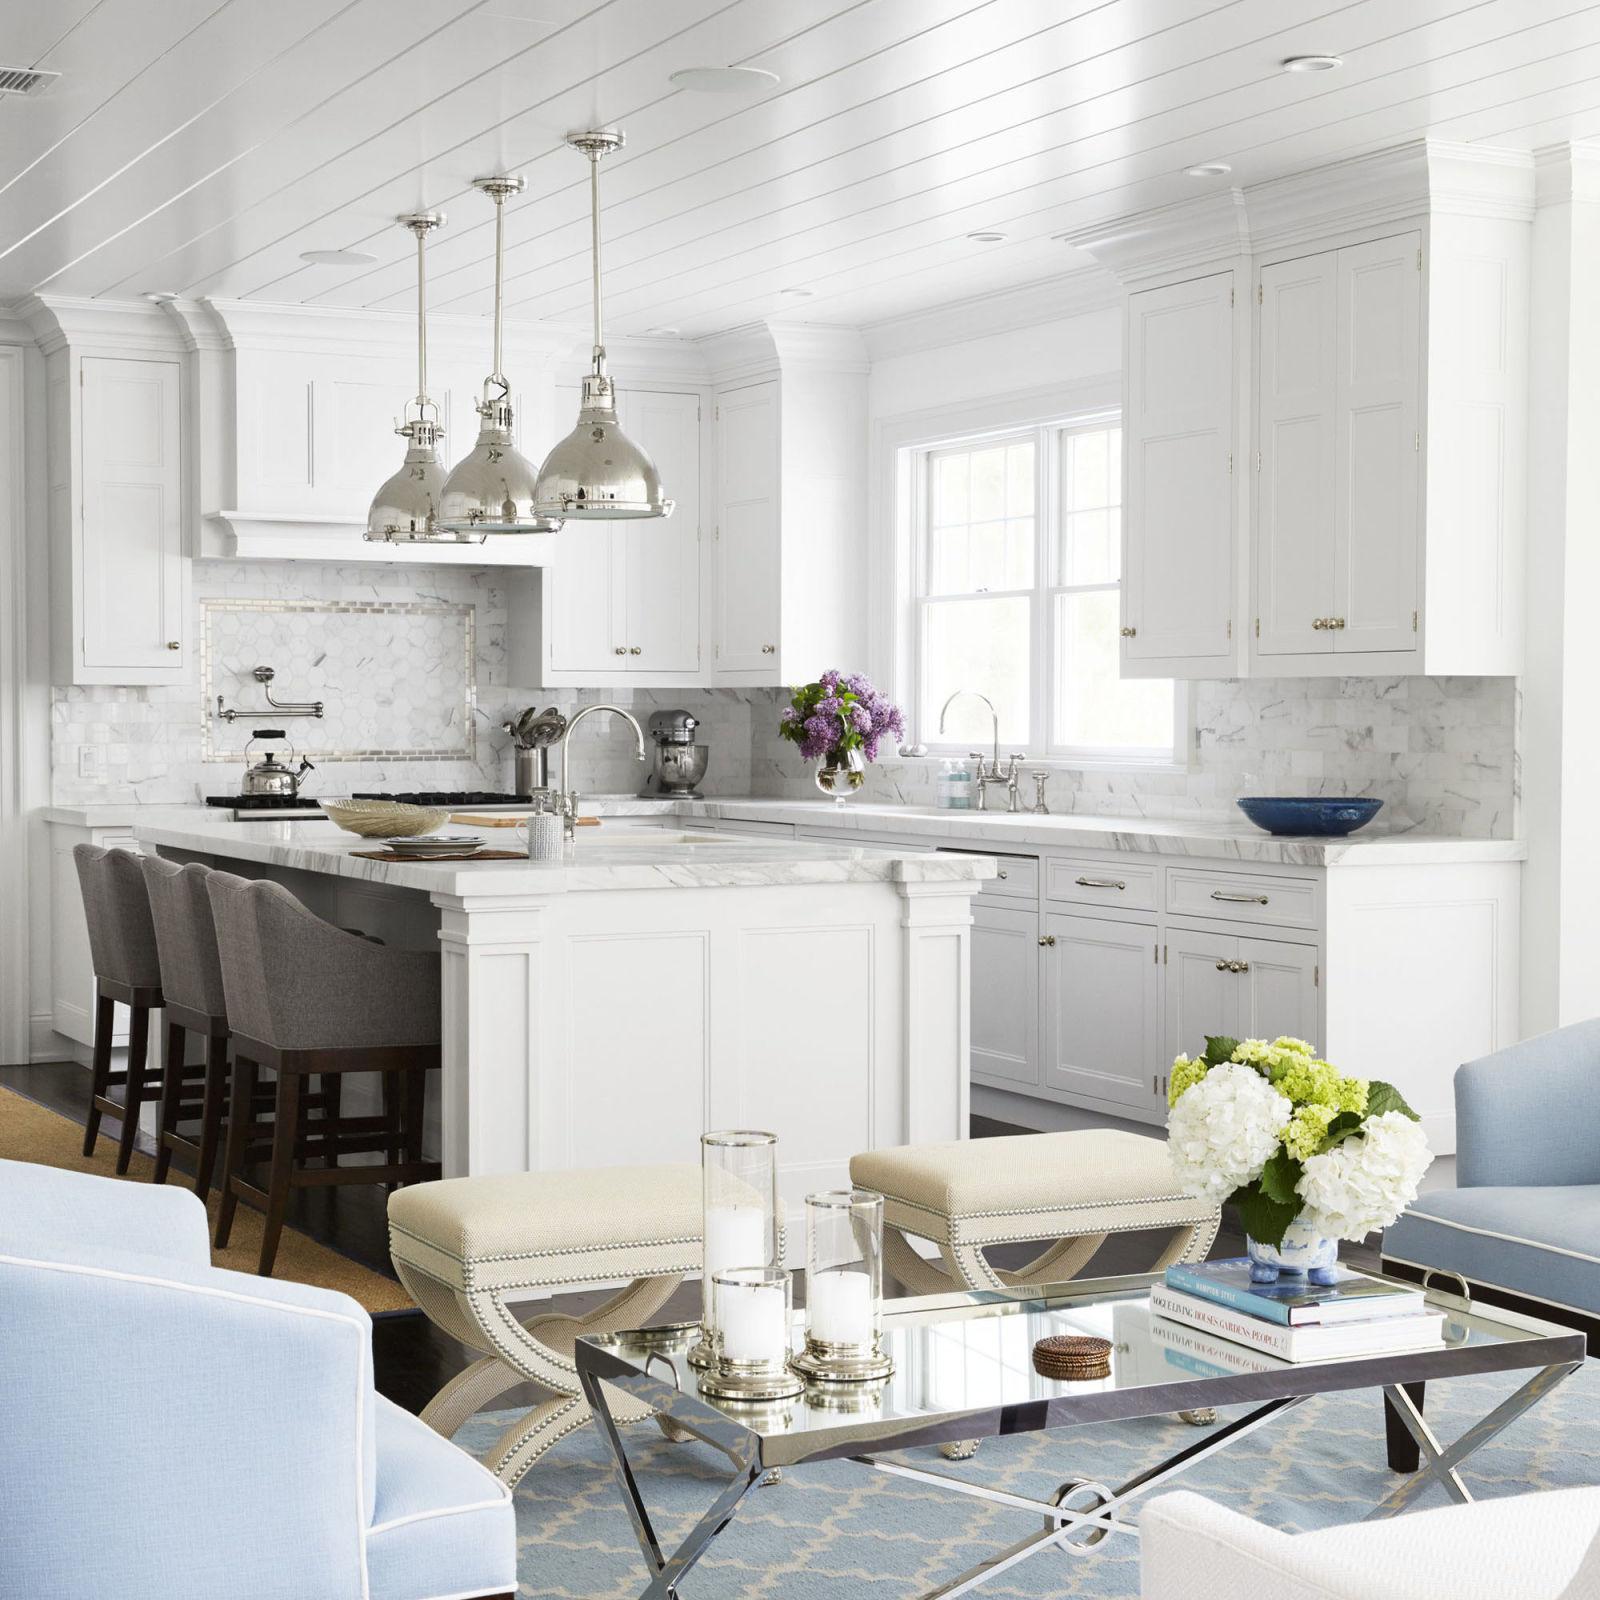 75 Trendy Open Concept Kitchen Design Ideas: Make An Open Kitchen More Cozy